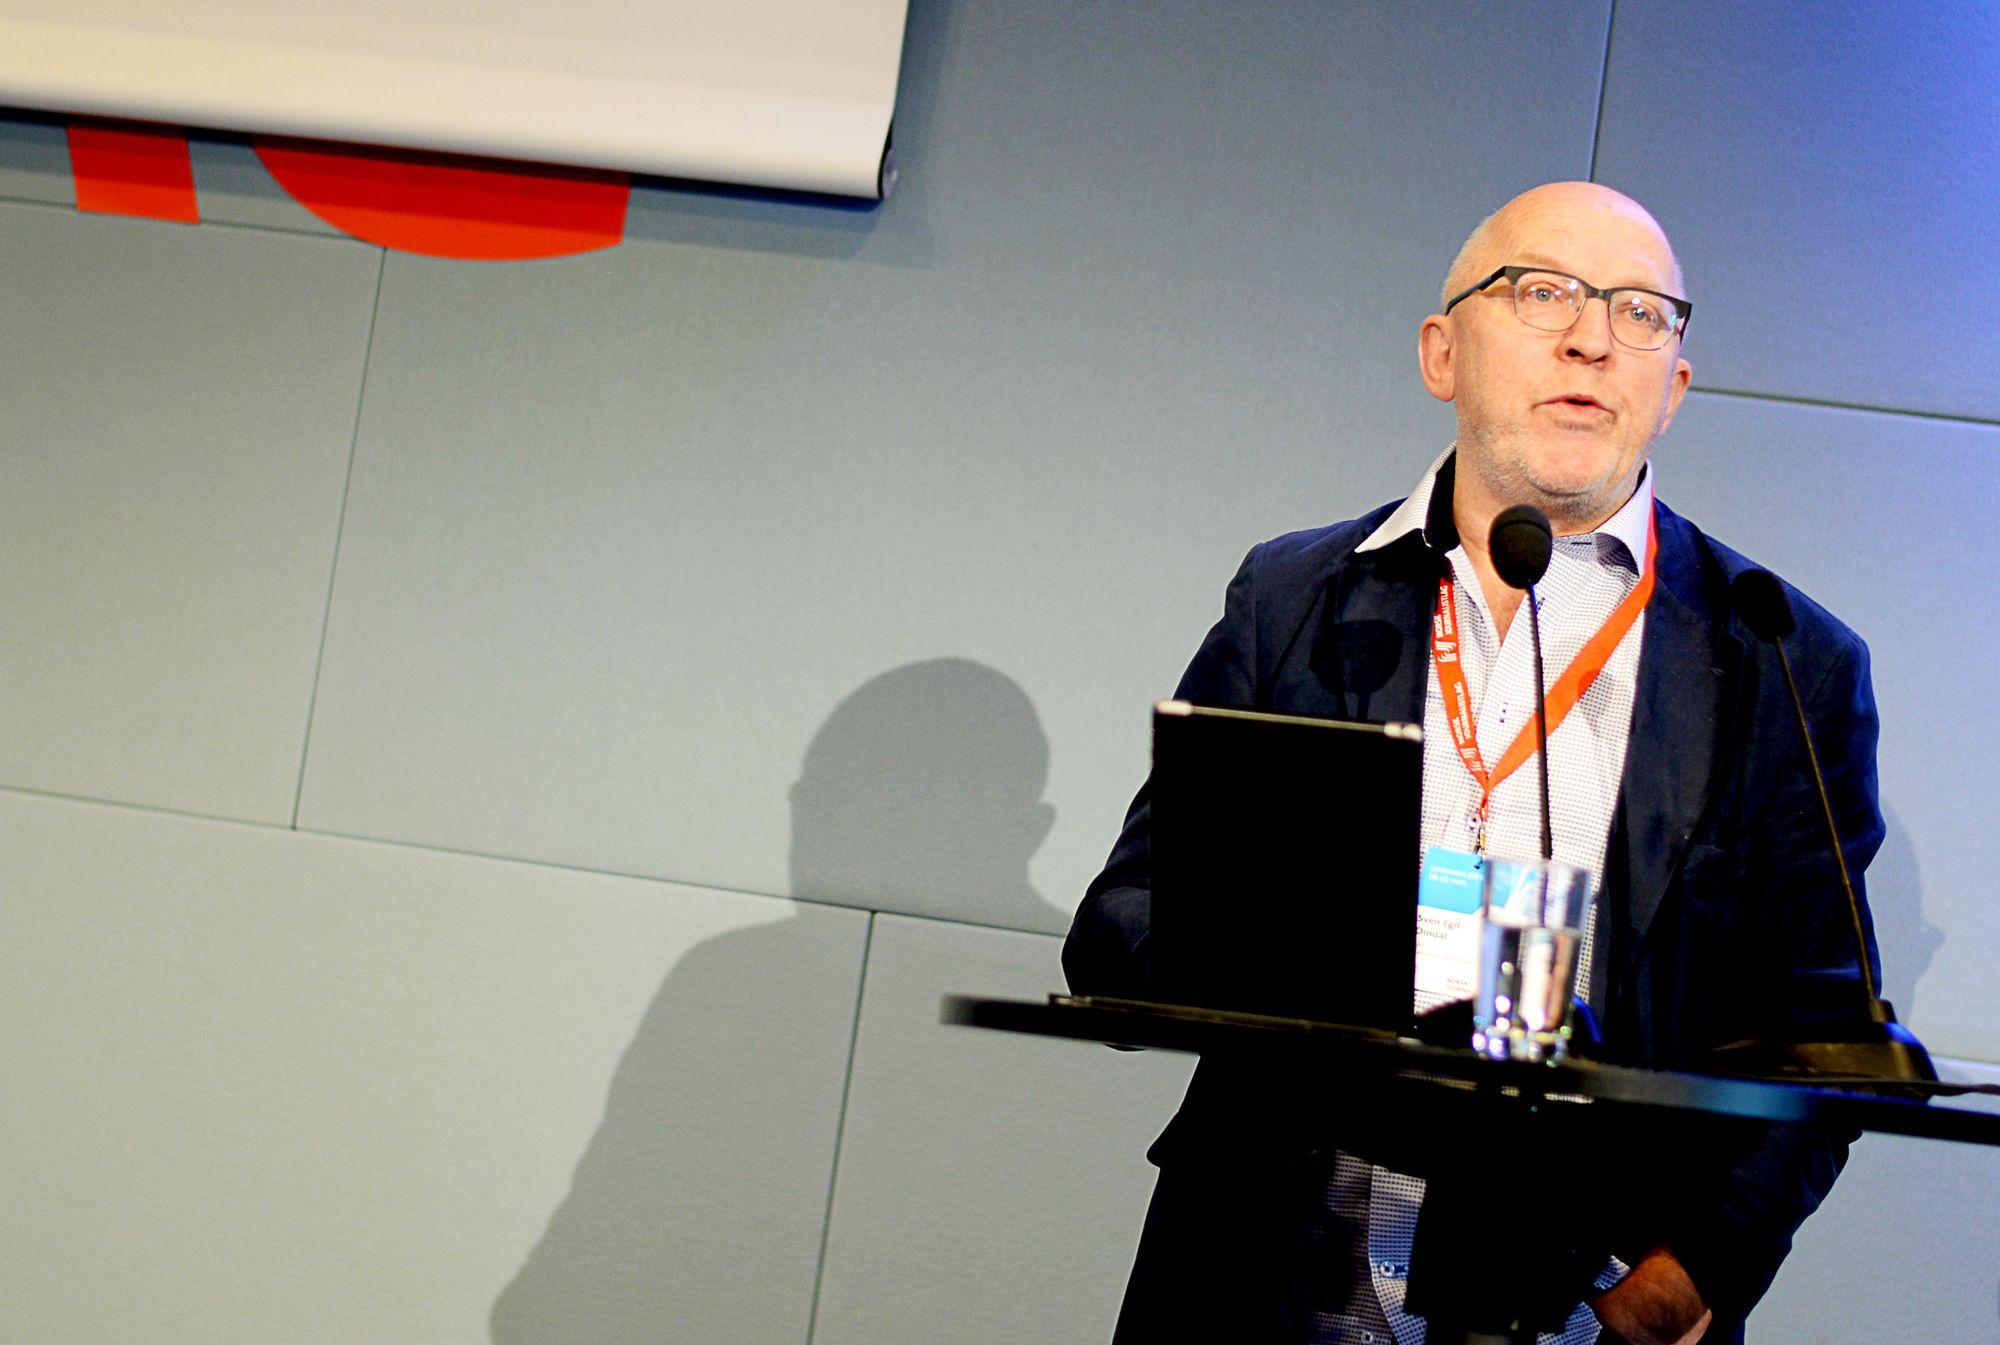 Sven Egil Omdal, mediekritiker og kommentator.